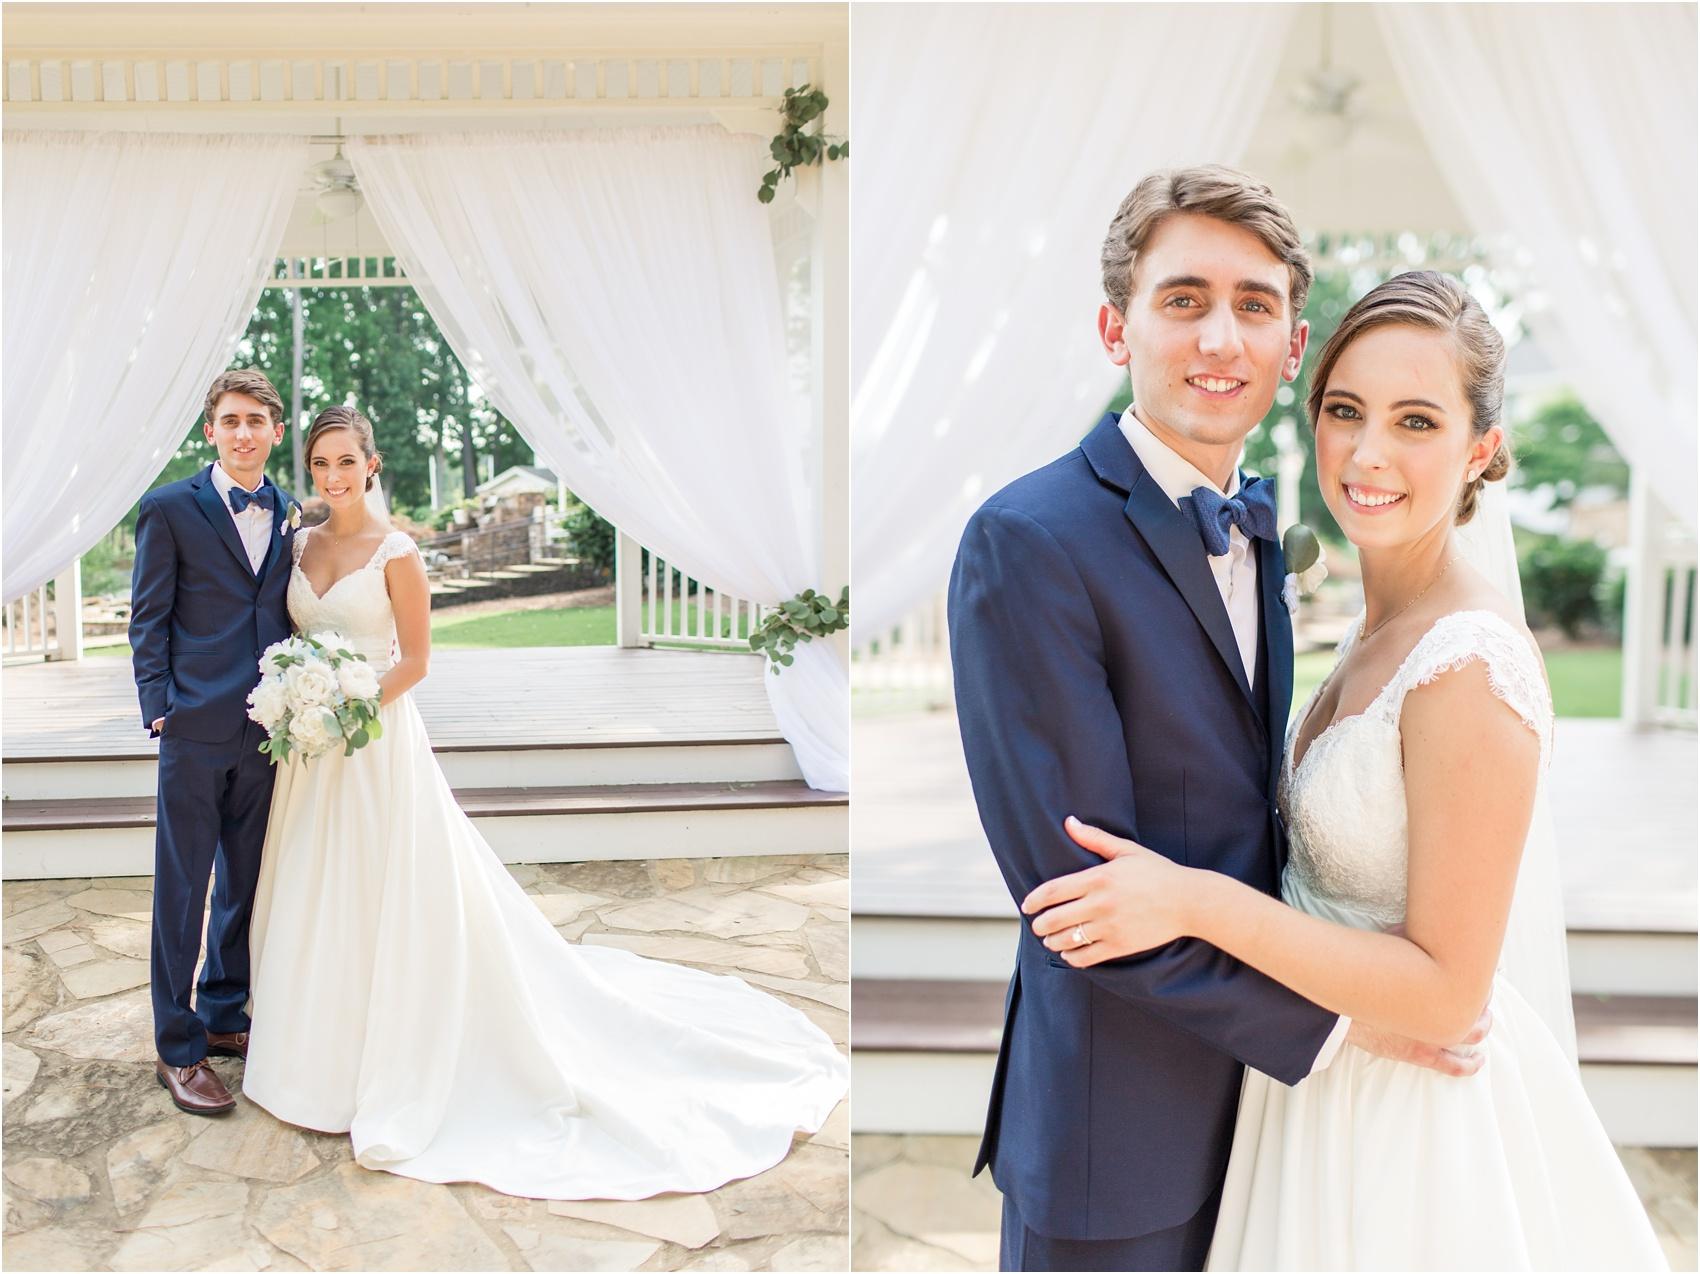 Savannah Eve Photography- Sigl-Adams Wedding- Sneak Peek-50.jpg